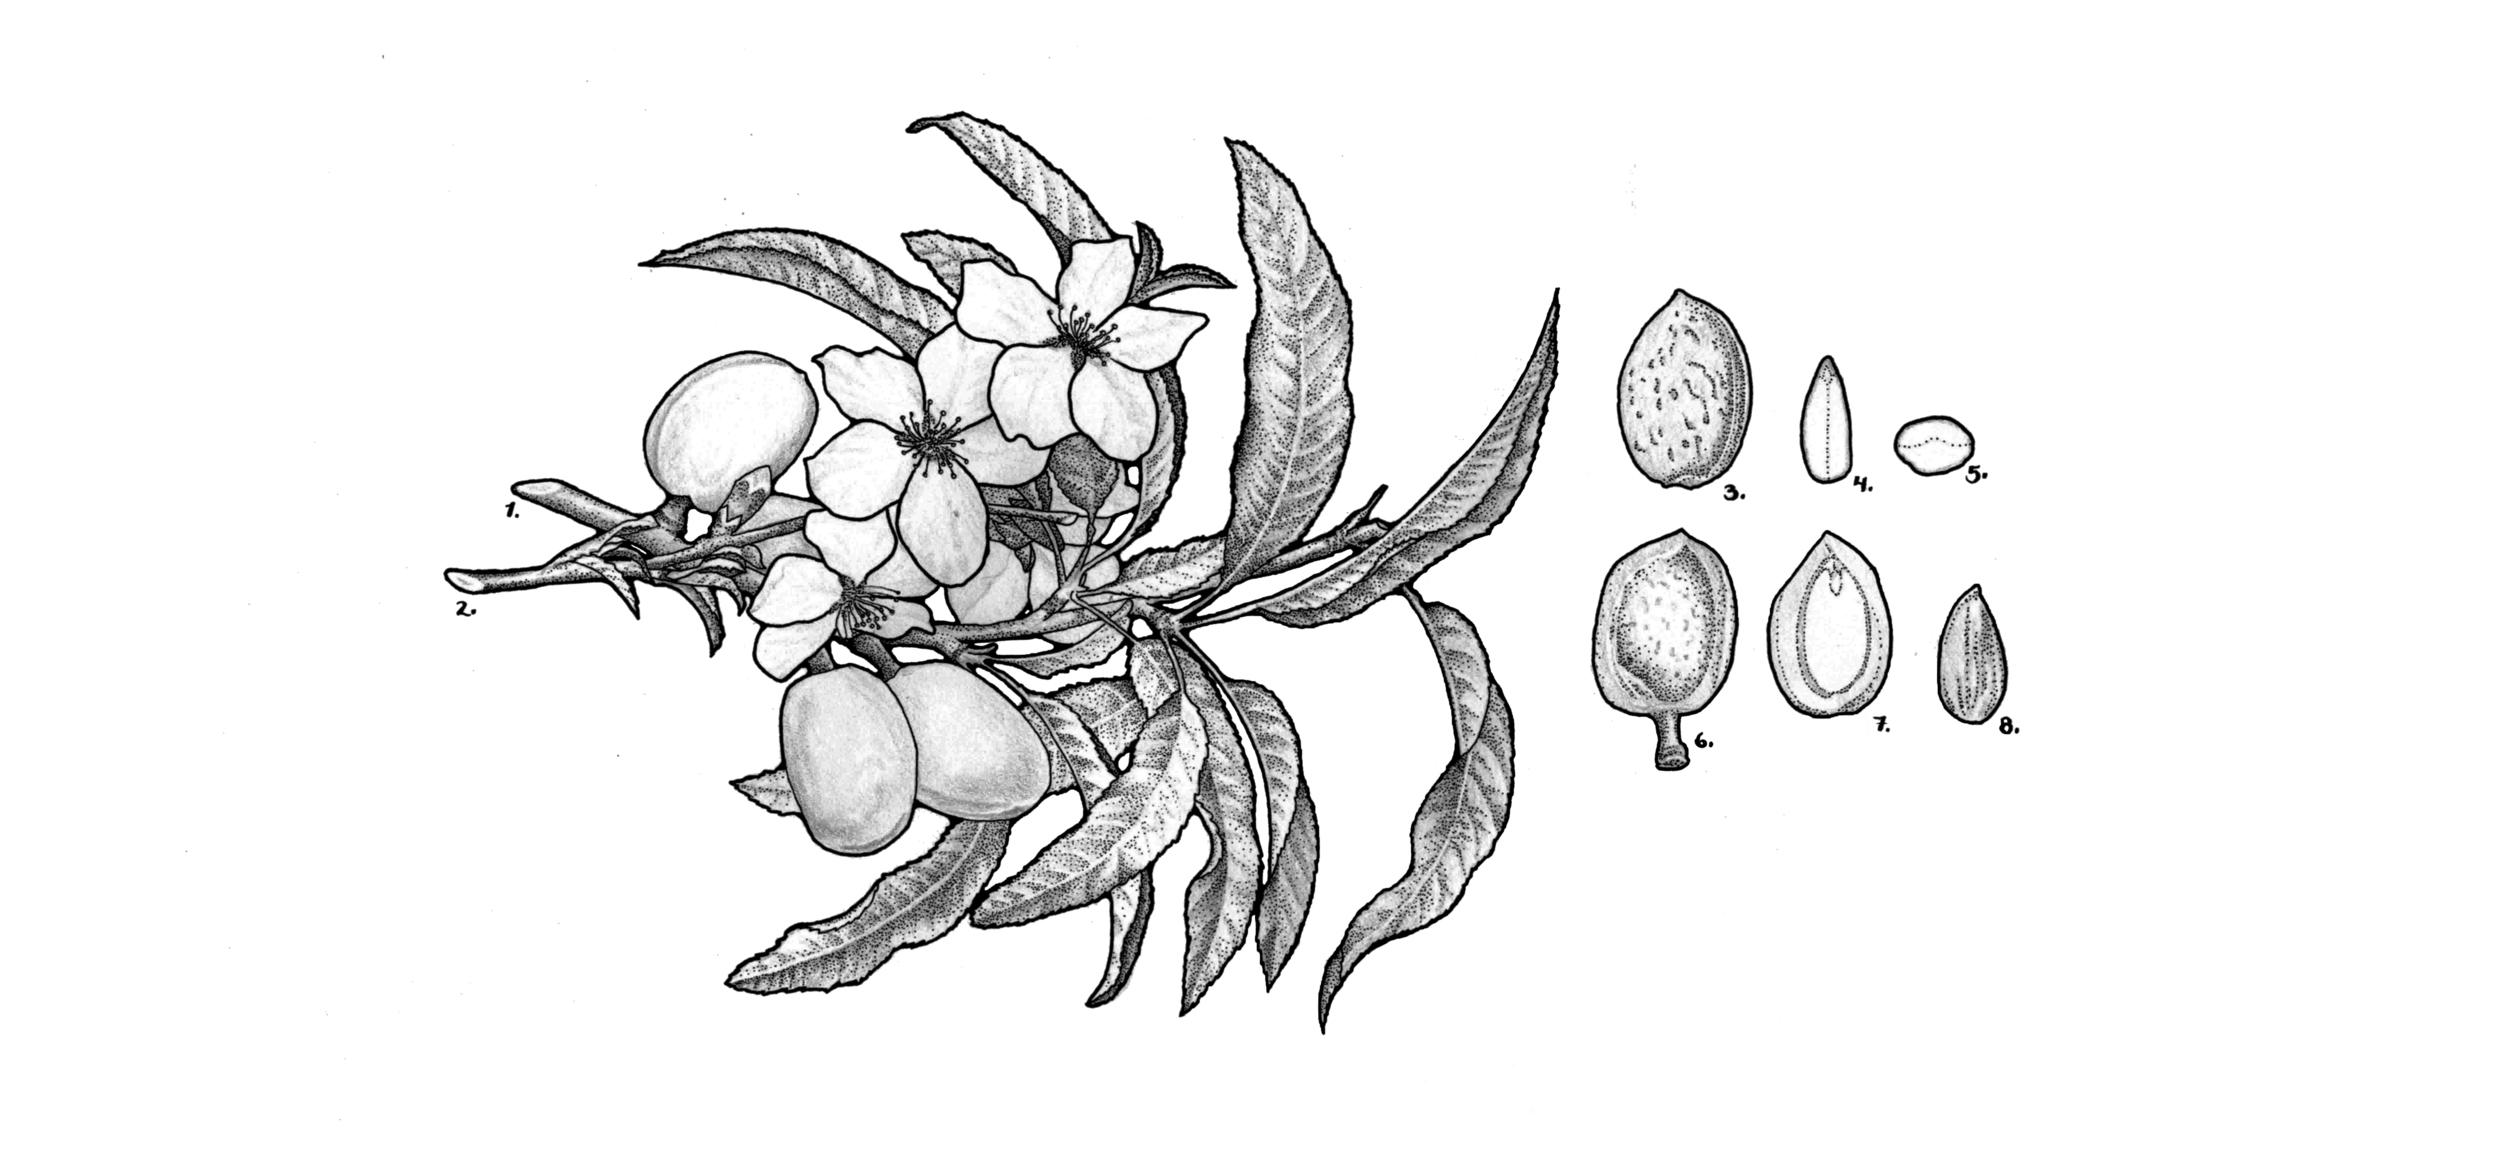 Prunus dulcis (sweet almond)